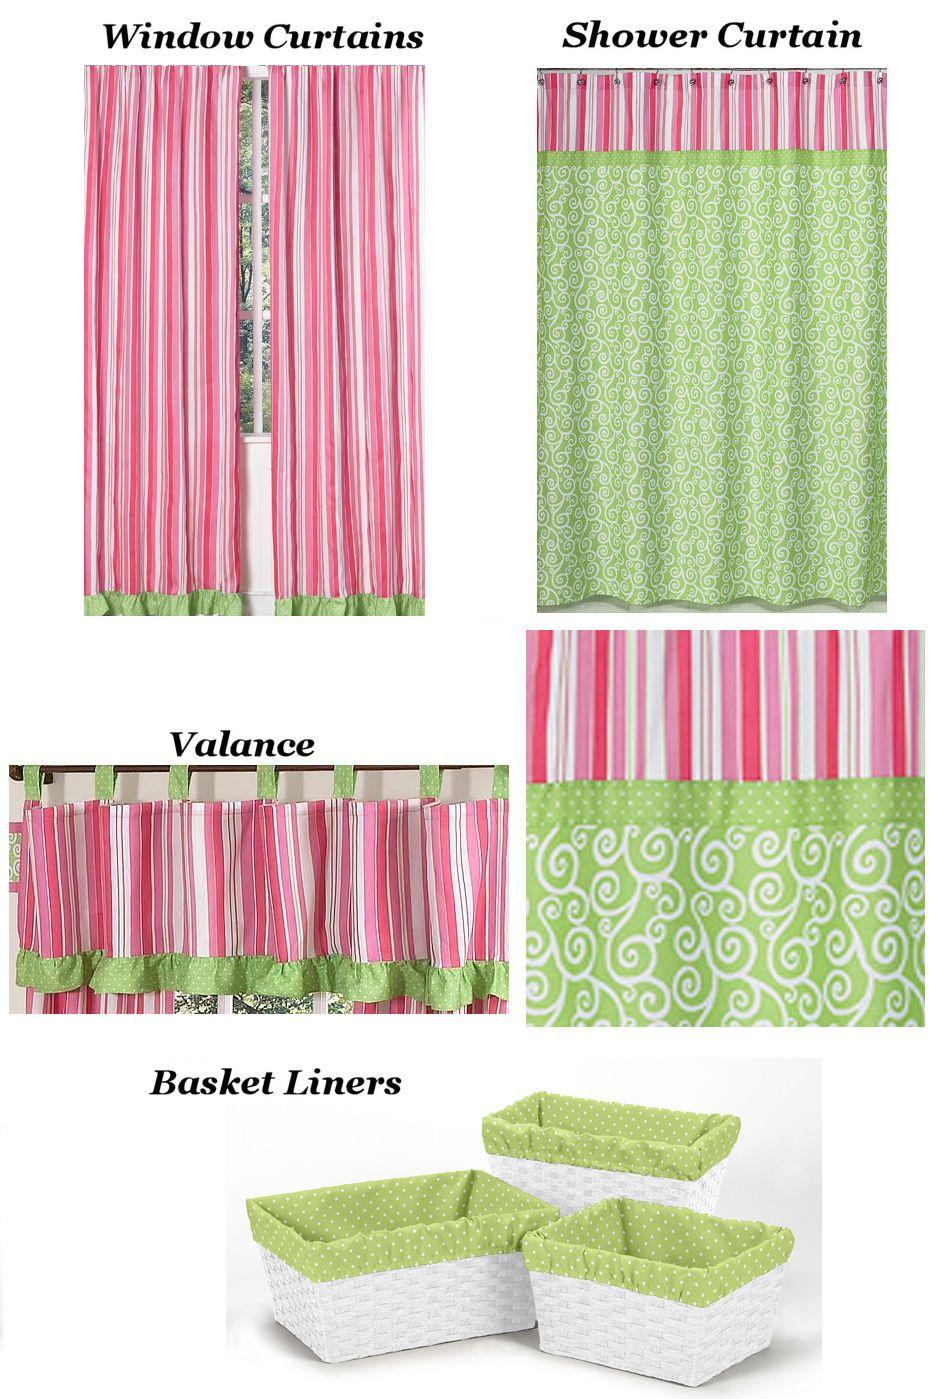 Curtains and basket liners girls comforter sets shower